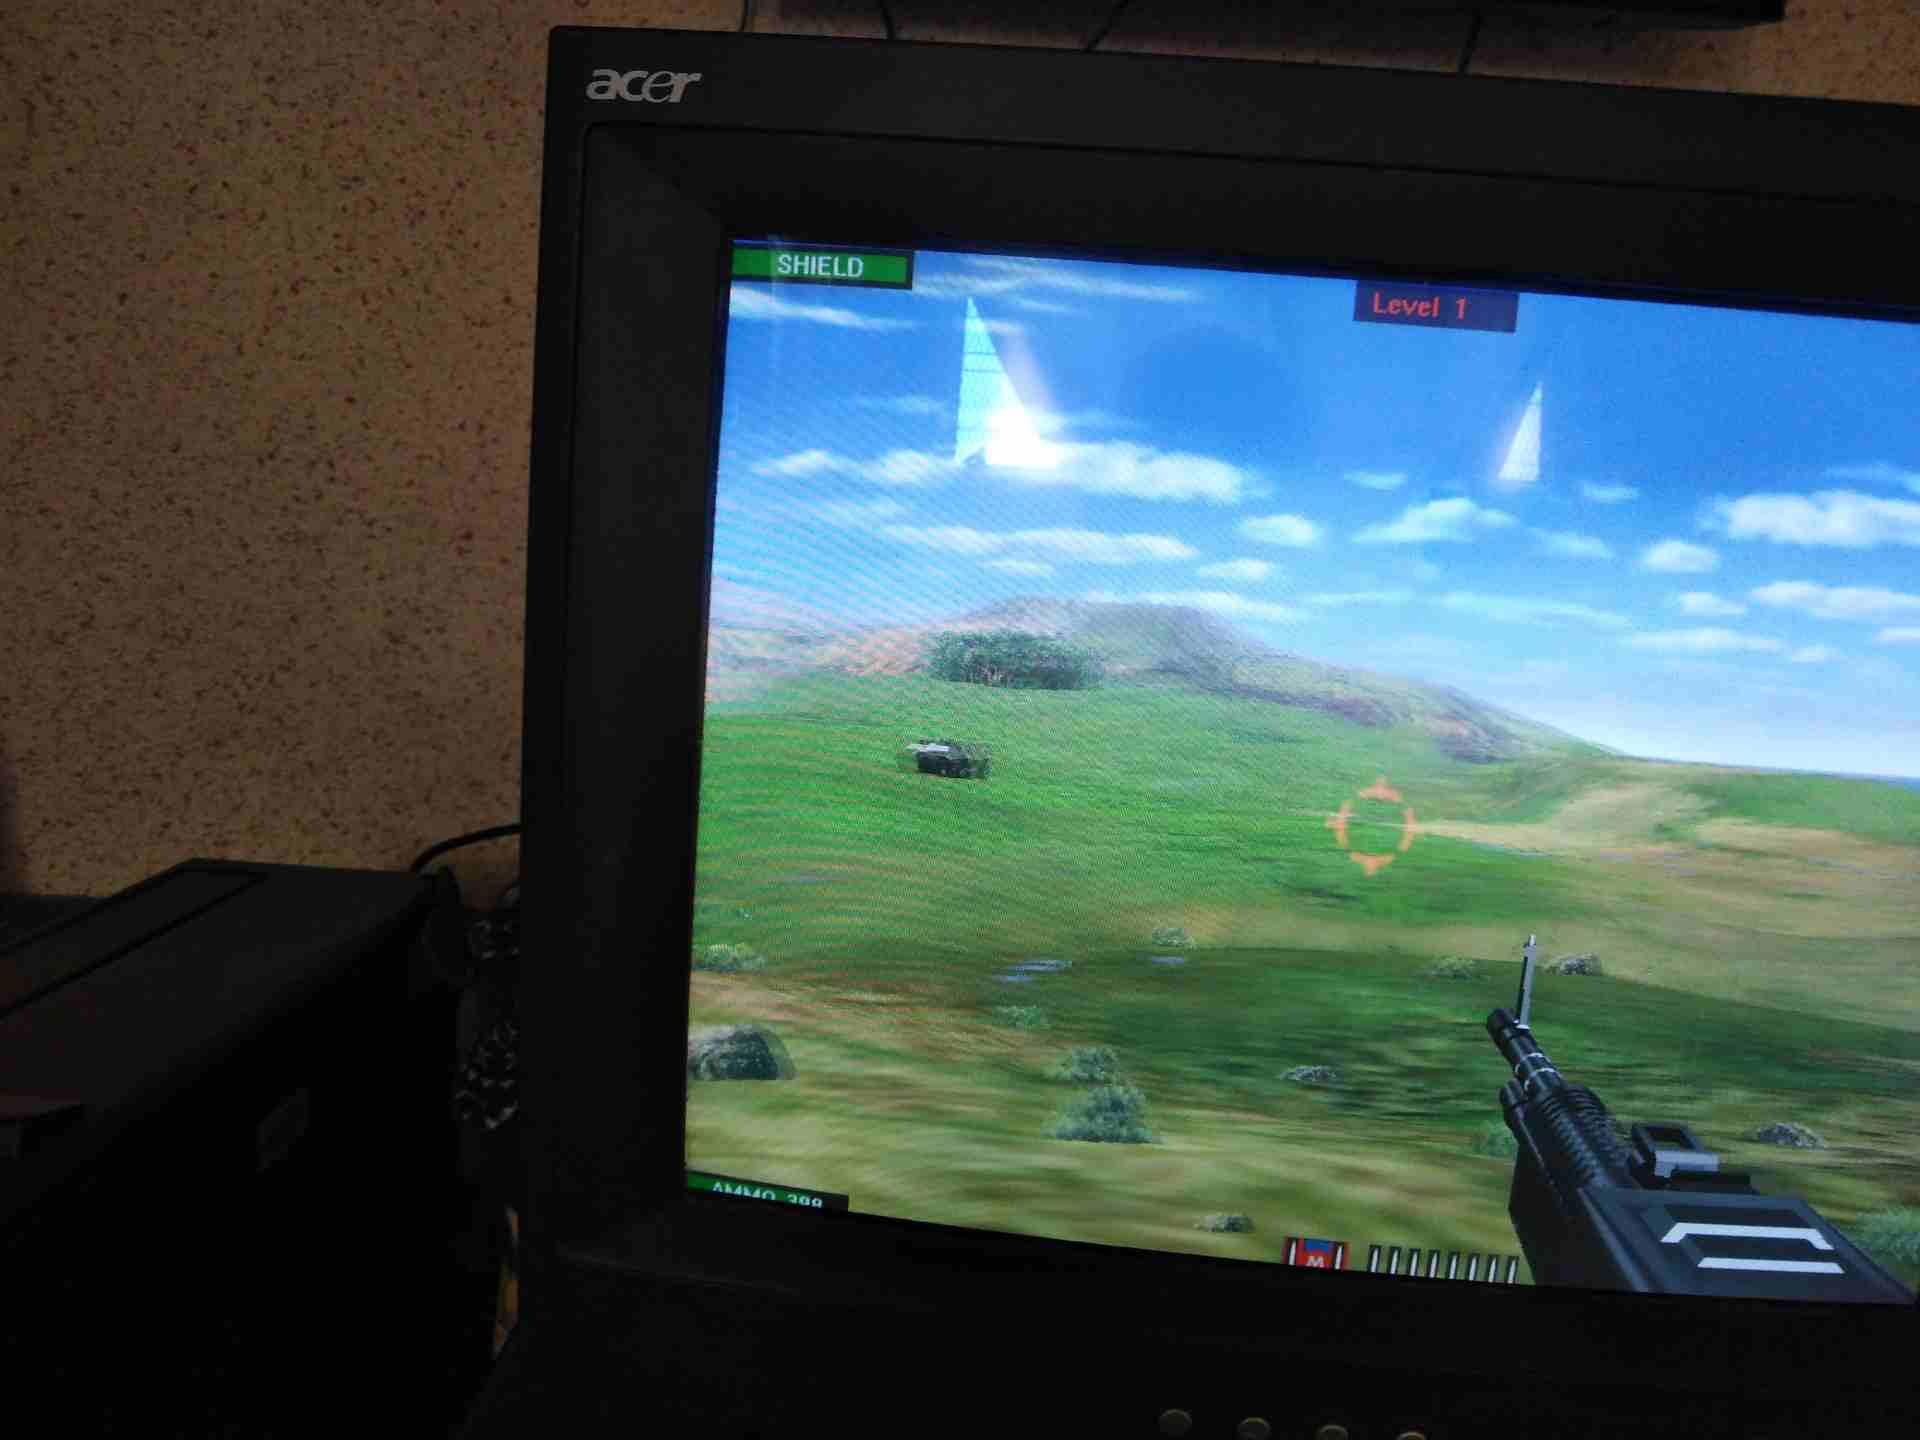 PC Dubai للألعاب الالكترونيةارتق بتجربة لعبك مع بعض من أفضل منتجات الألعاب المتوفرة على PC Du-  كمبيوتر نزل على 30لعبي...